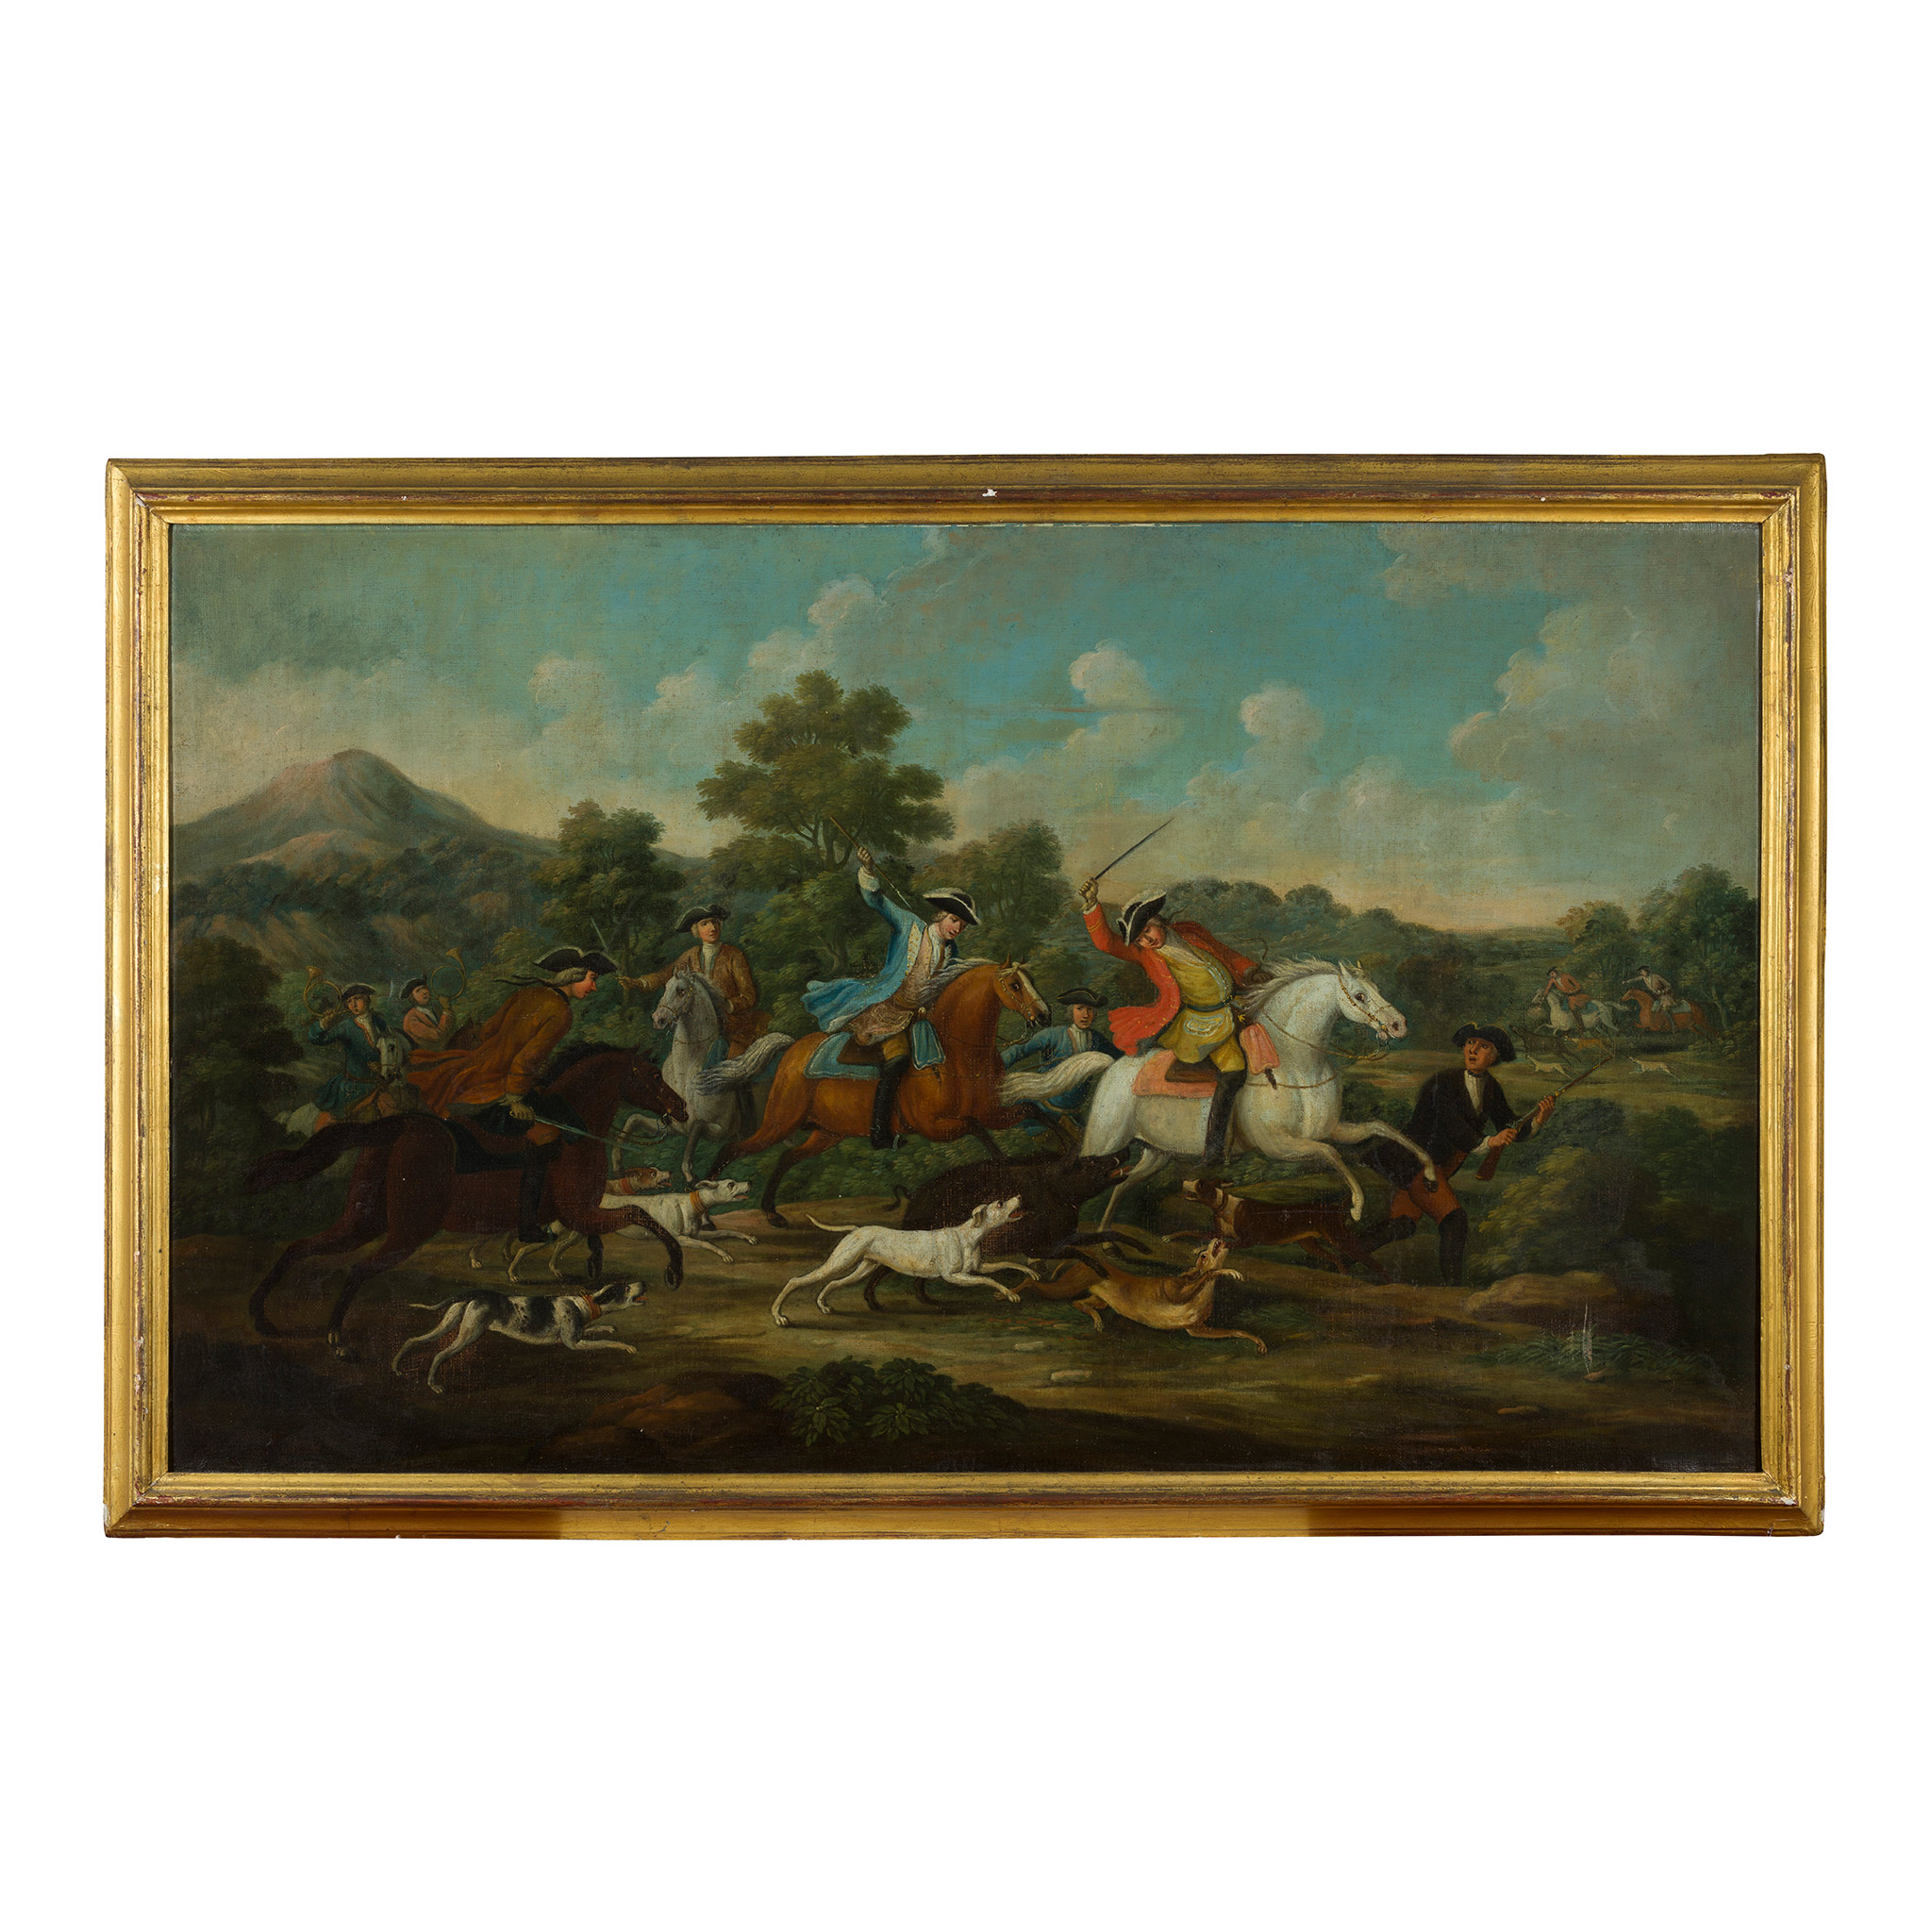 18TH CENTURY FRENCH SCHOOL ELEGANT FIGURES BOAR HUNTING - Image 5 of 8